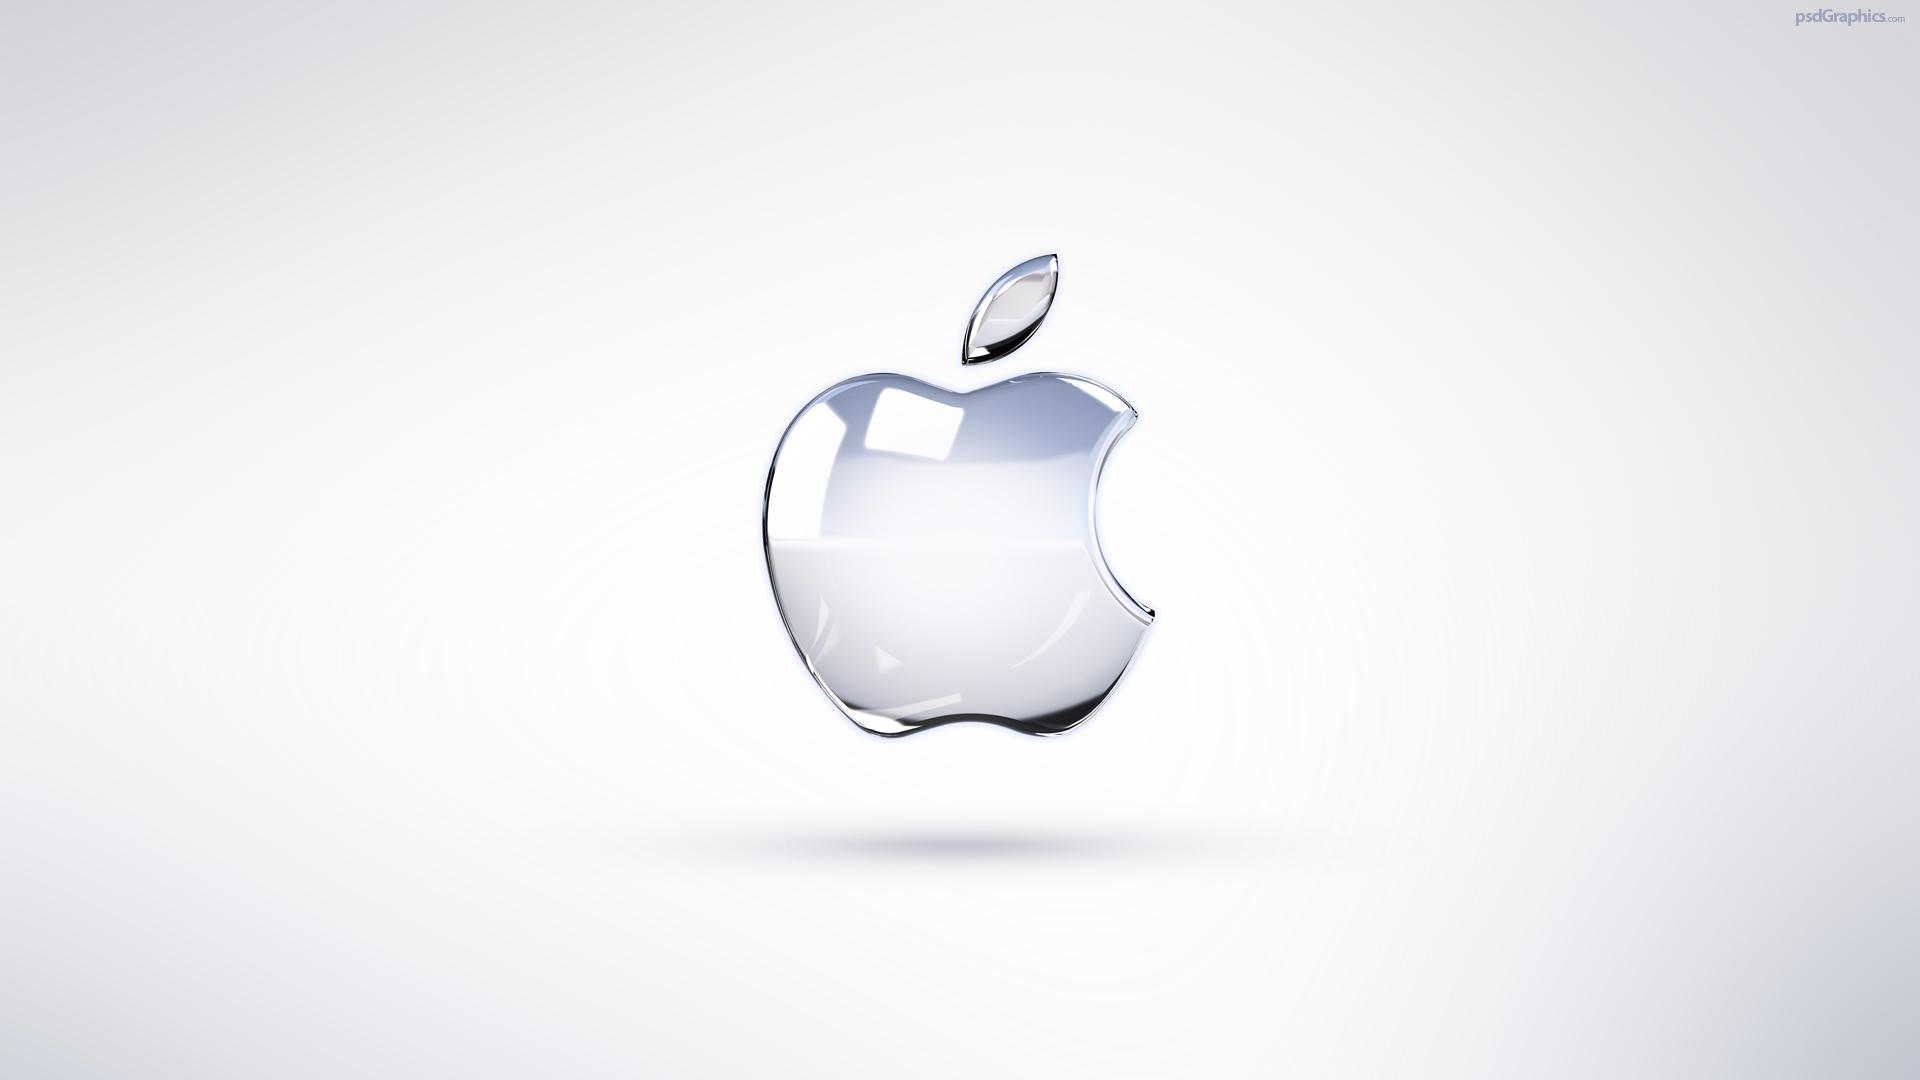 Apple-Logo-Hd-Desktop-Free-Download-1920x1080-wallpaper-wp3602656